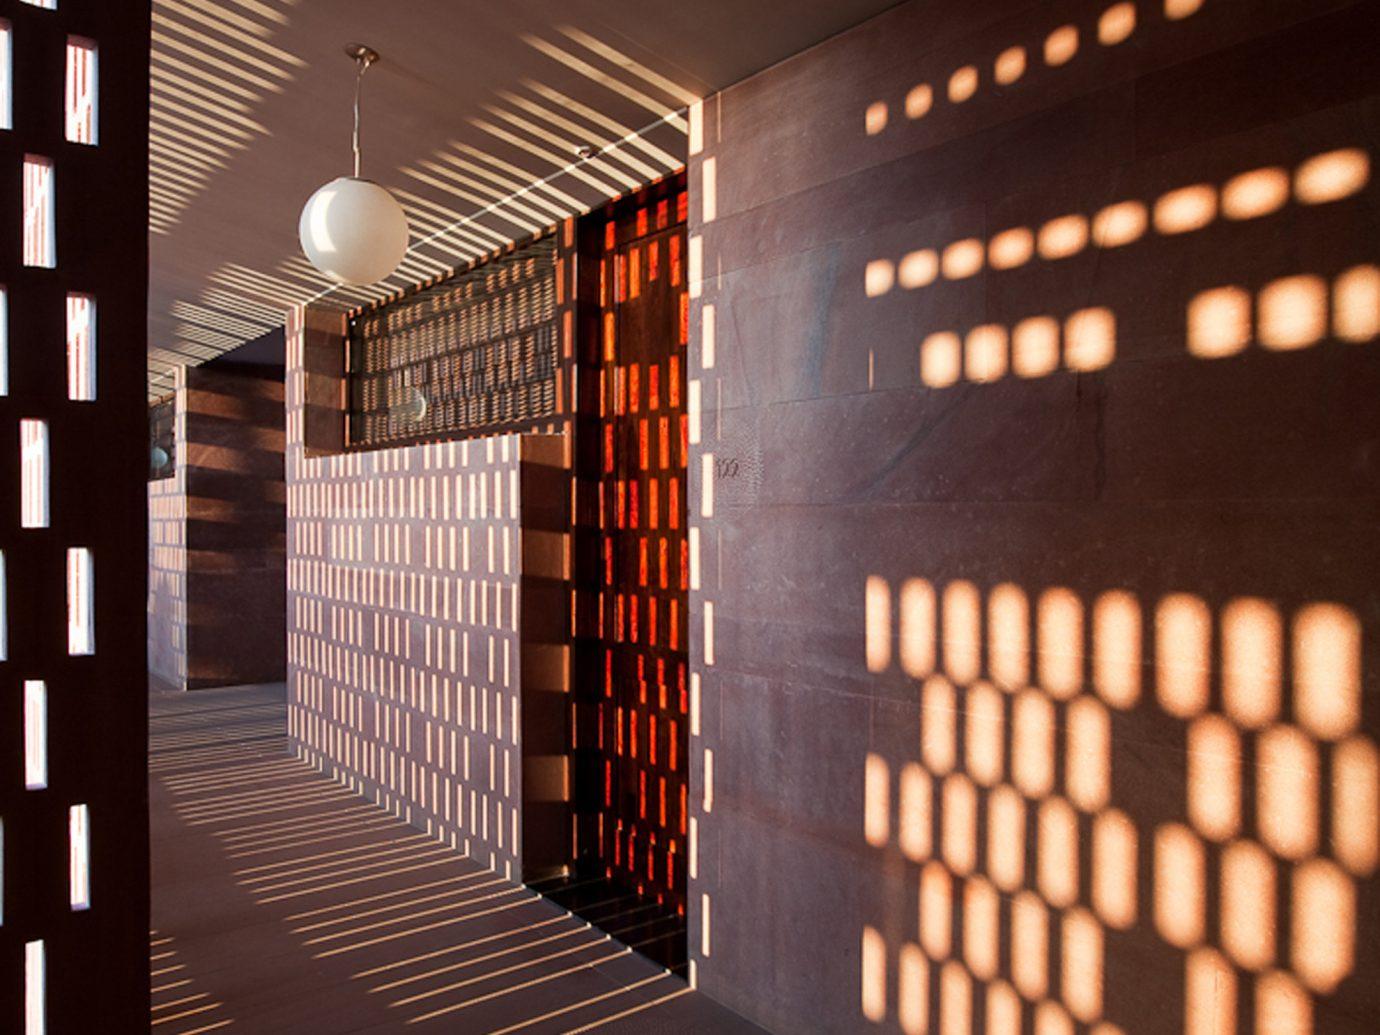 Hotels light interior design lighting Winery Design window covering furniture